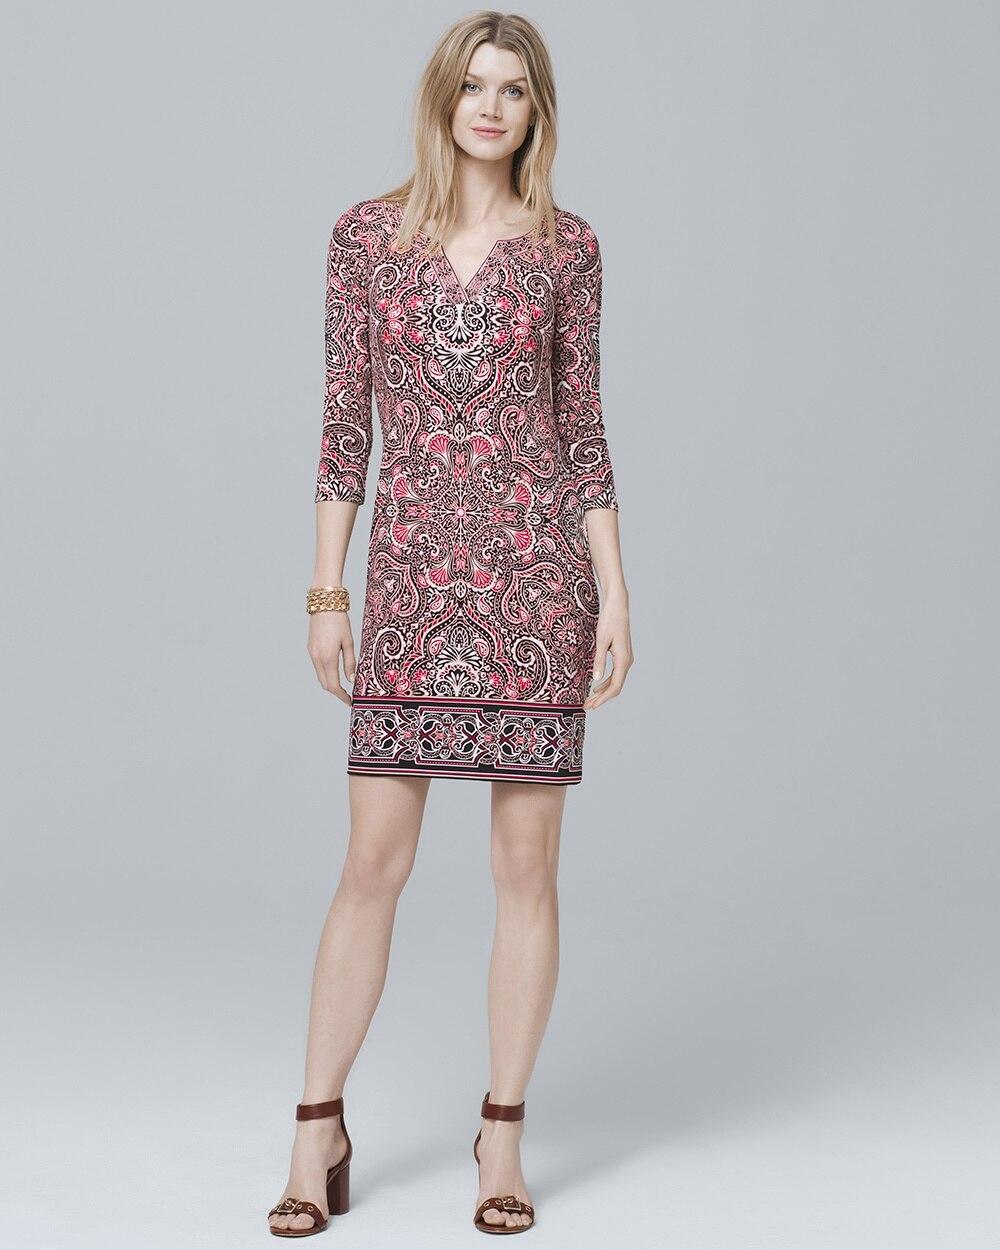 d34a2cfd06b Three Quarter-Sleeve Paisley Knit Shift Dress - White House Black Market